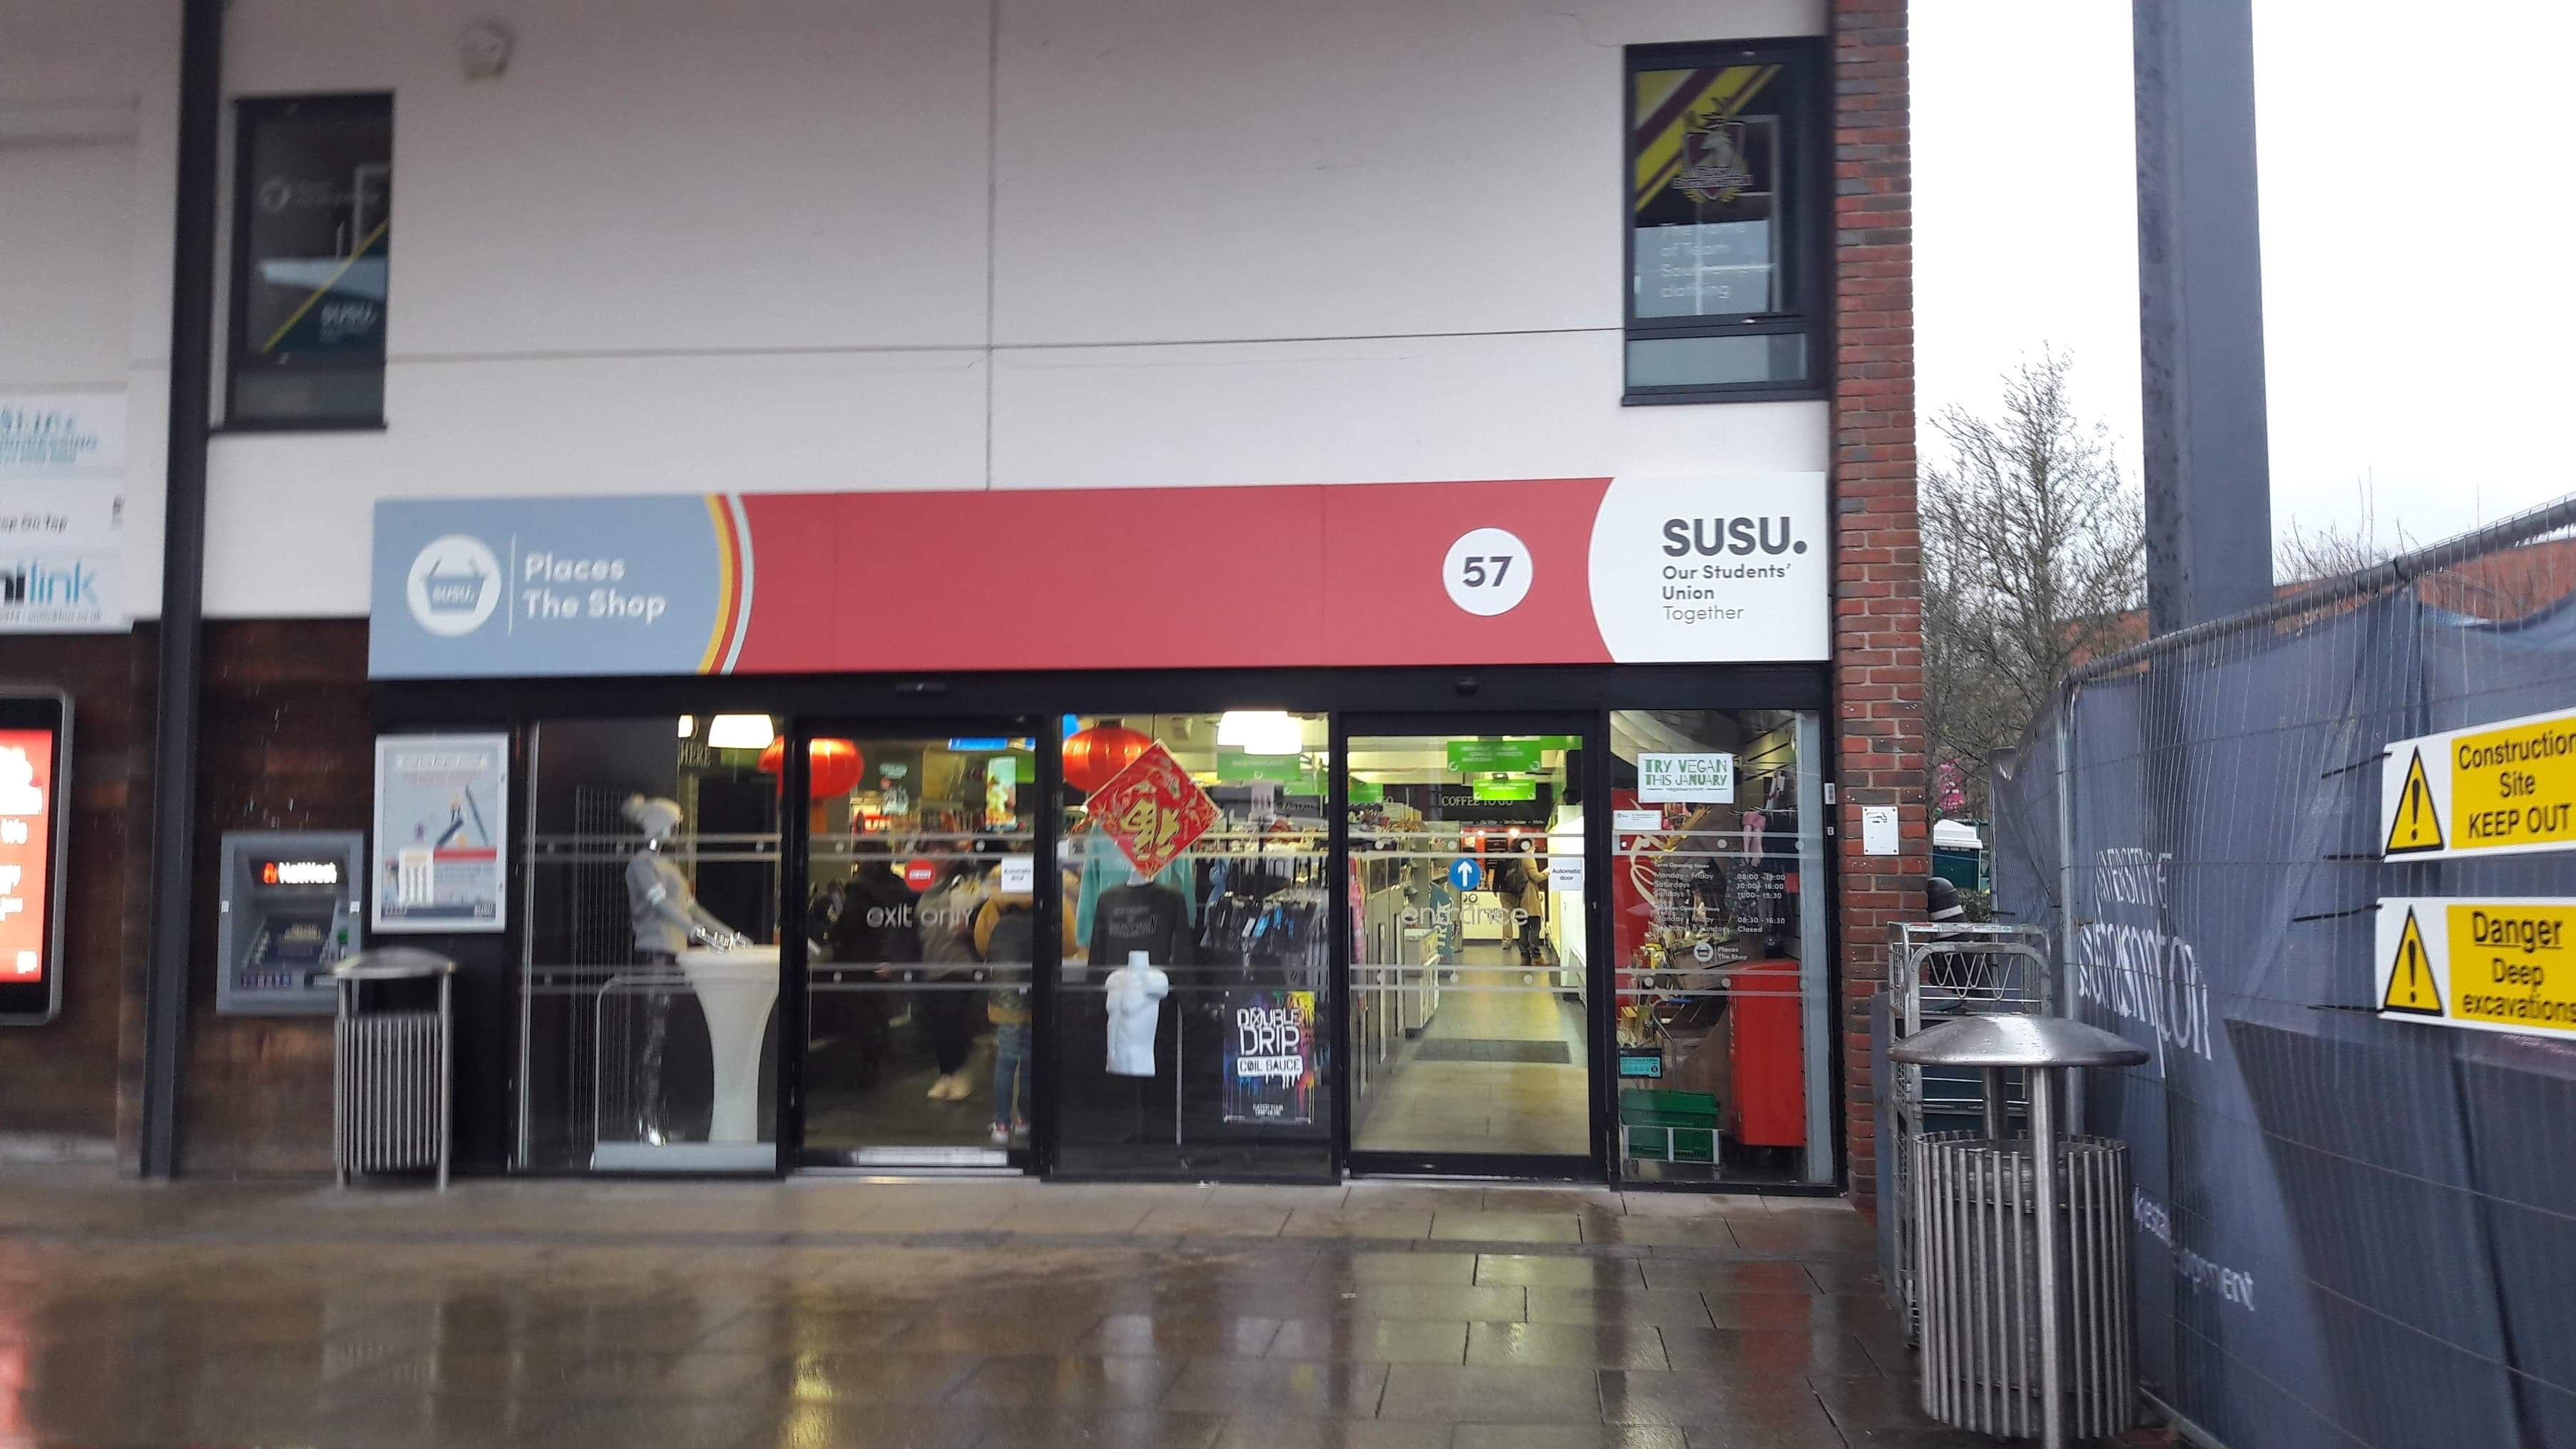 Image may contain: Kiosk, Shop, Human, Person